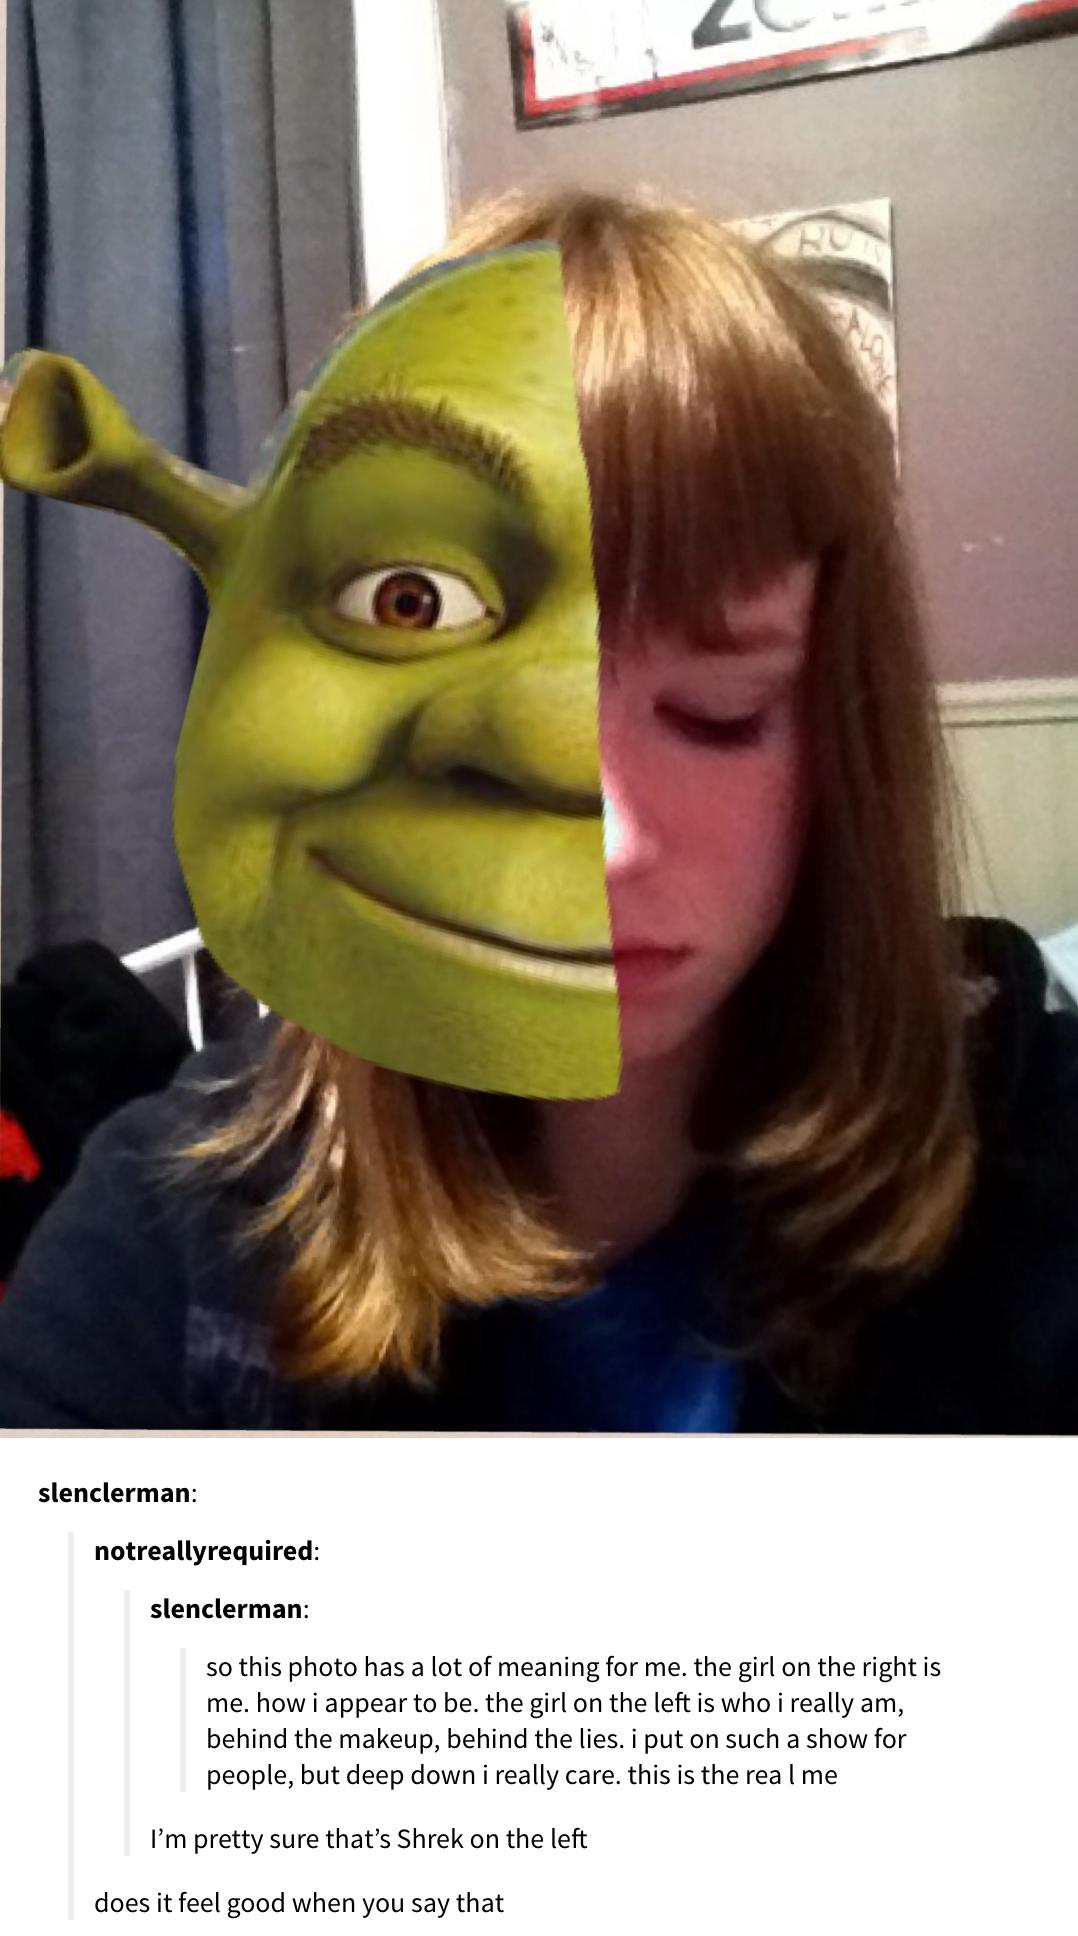 24 Shrek Posts That You Should Let No Innocent Child See